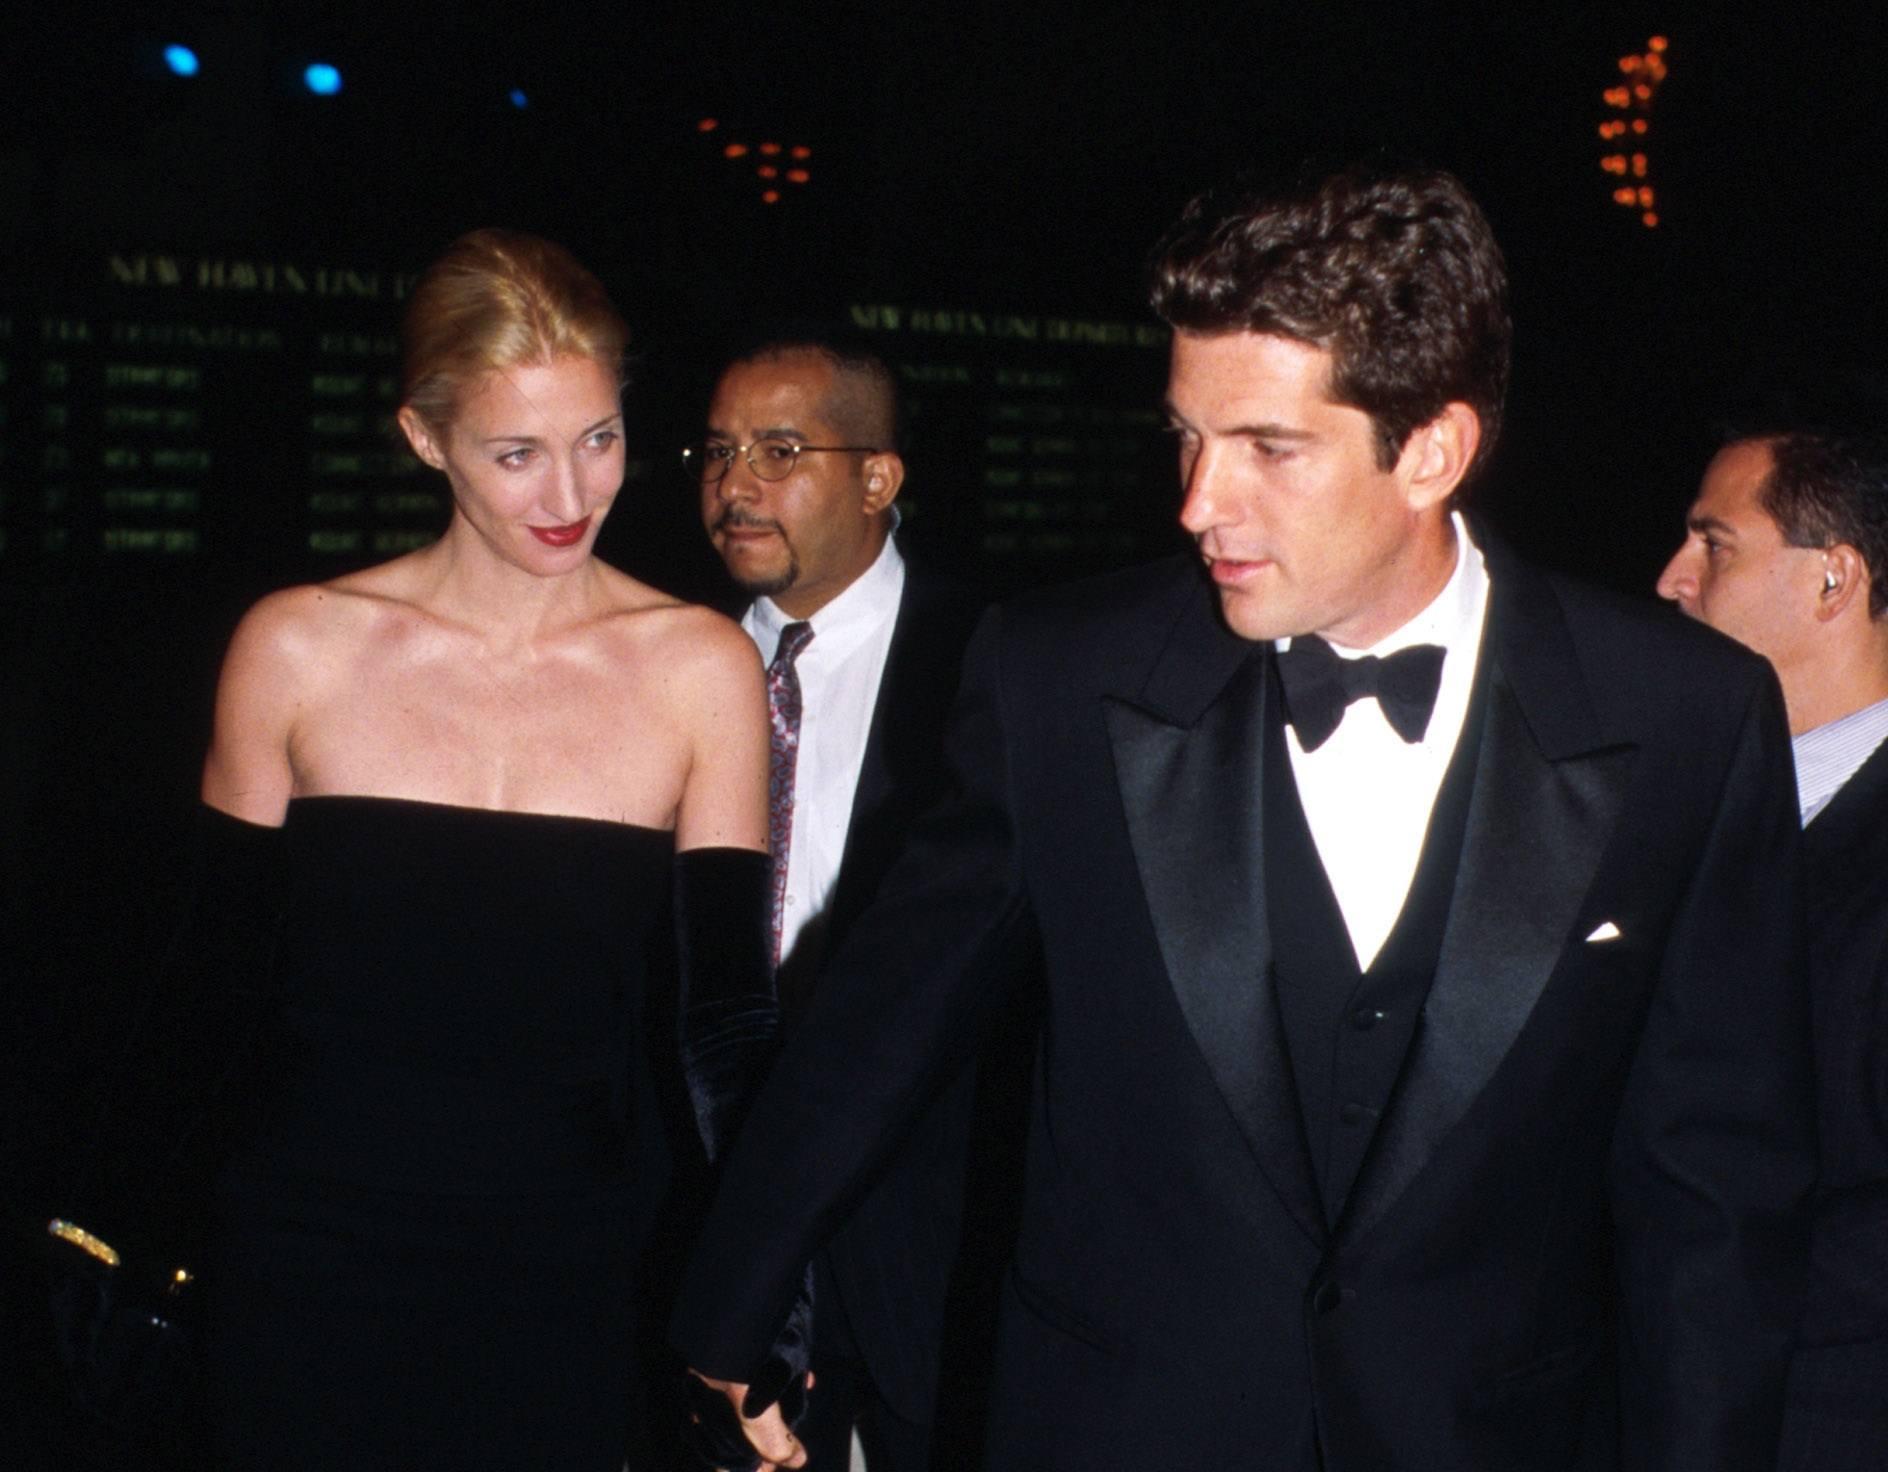 John F Kennedy Jr and Carolyn Bessette